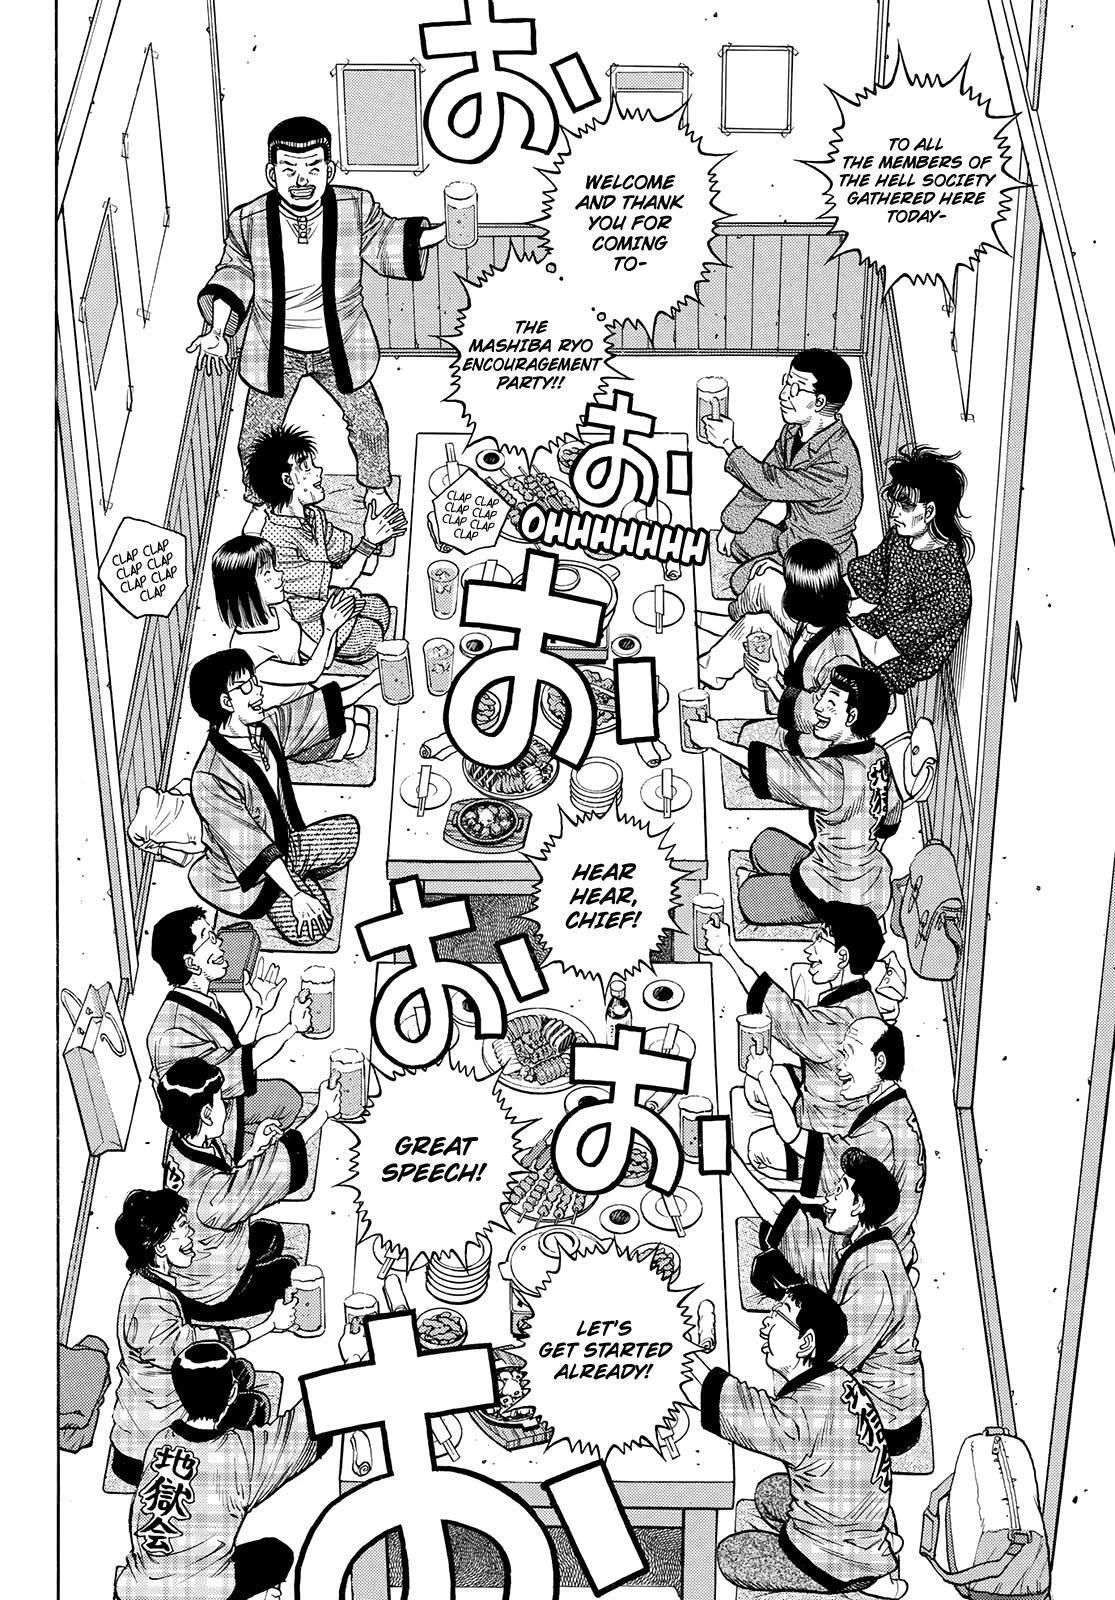 Hajime No Ippo Chapter 1352: Encouragement Party page 2 - Mangakakalot